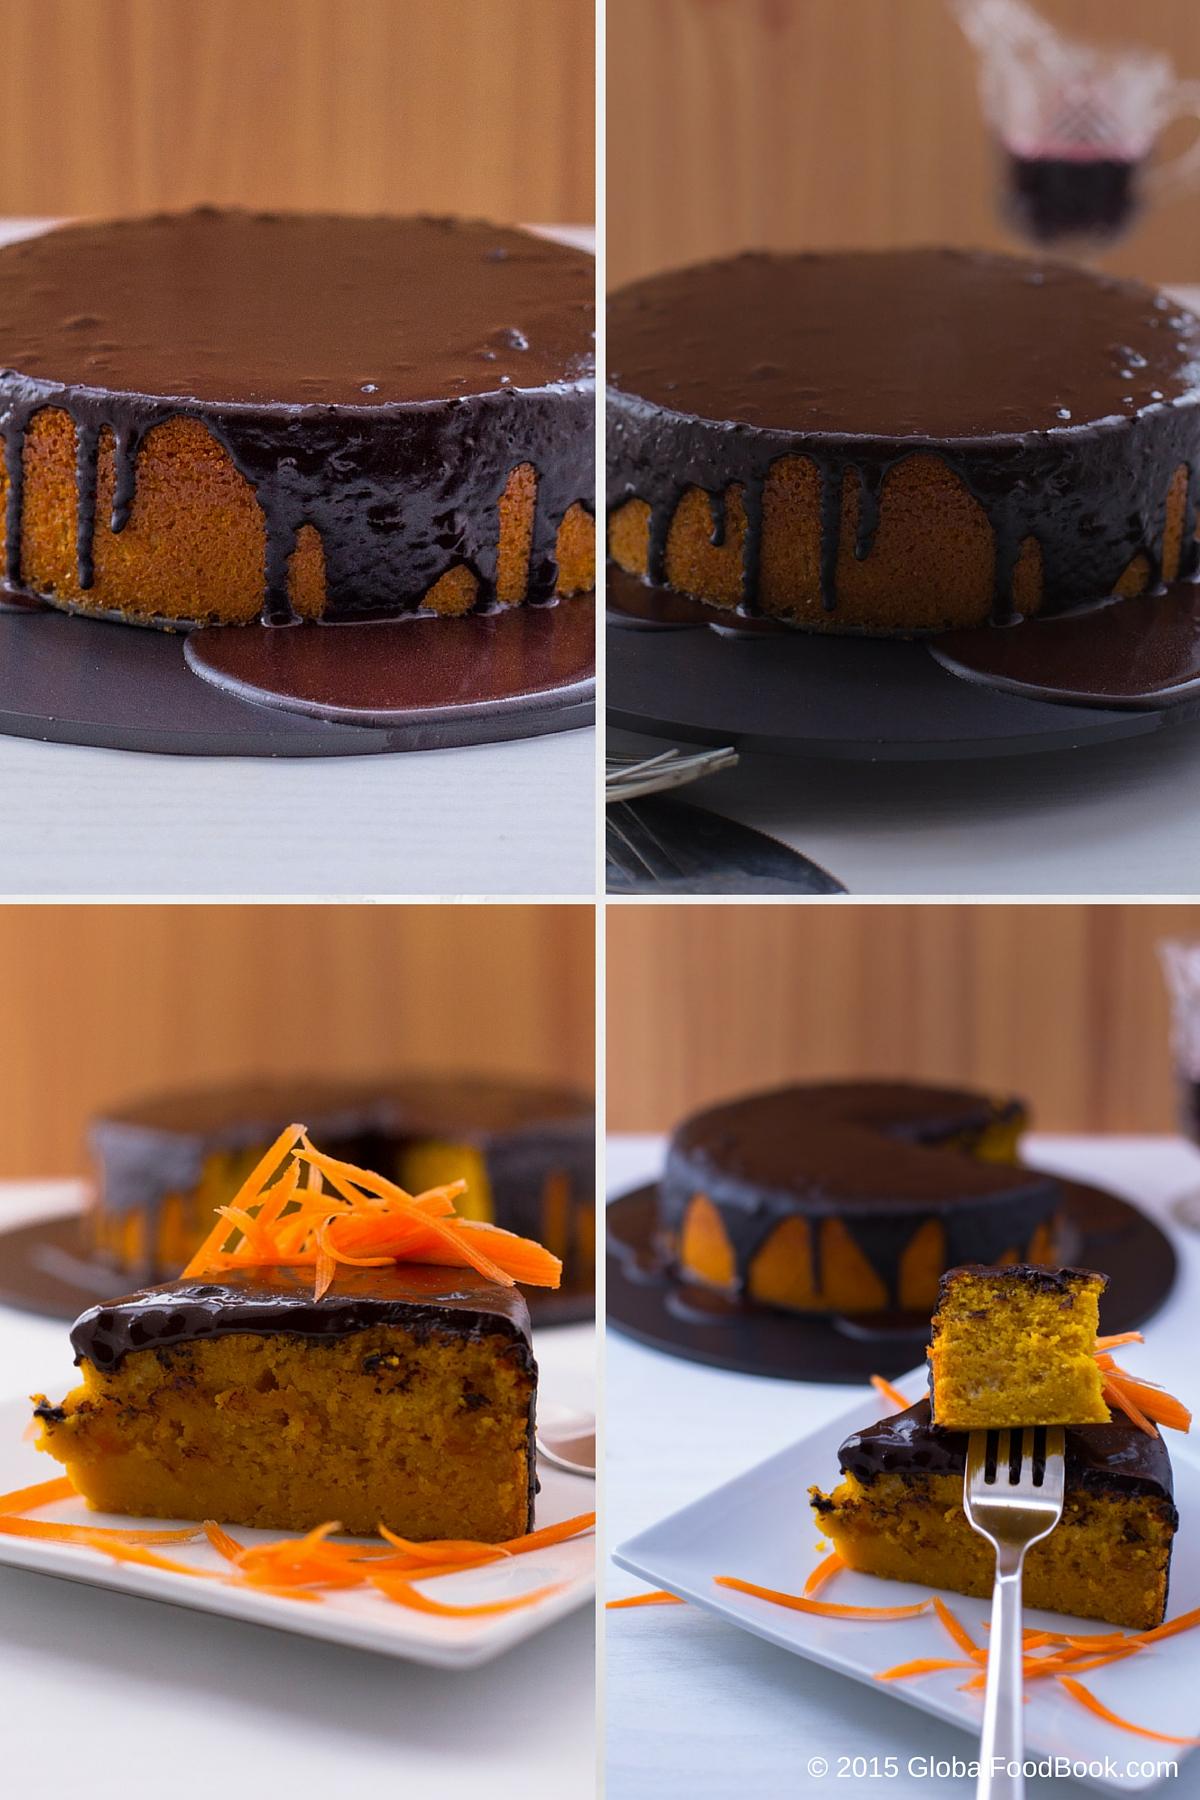 Brazilian Carrot Cake With Chocolate Icing